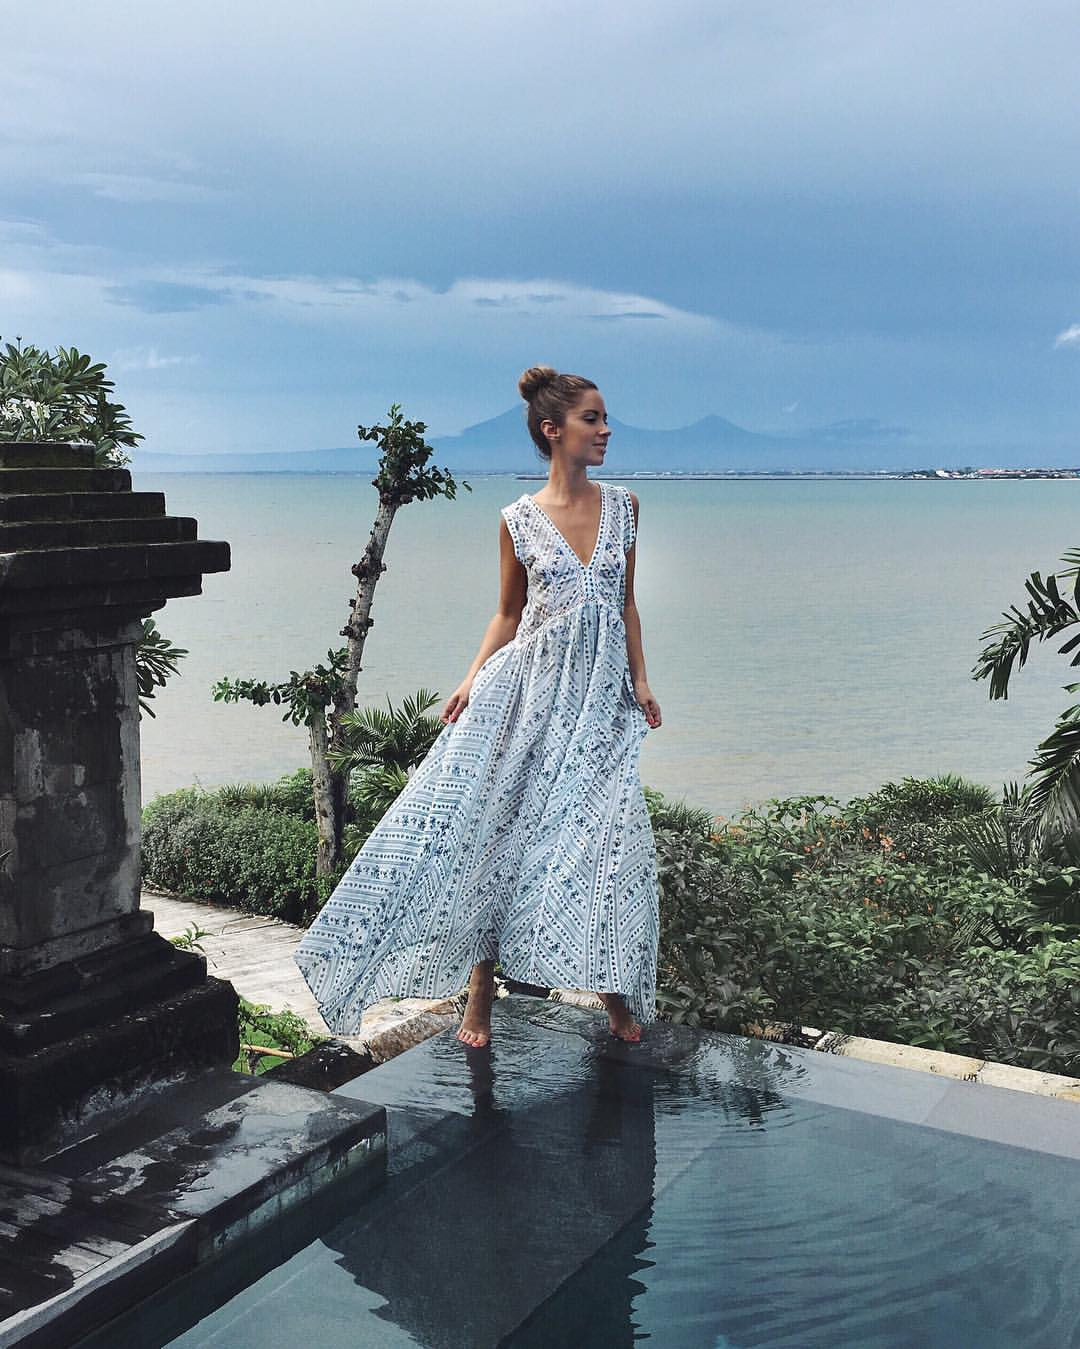 Friend in Fashion Four Seasons Bali.jpg